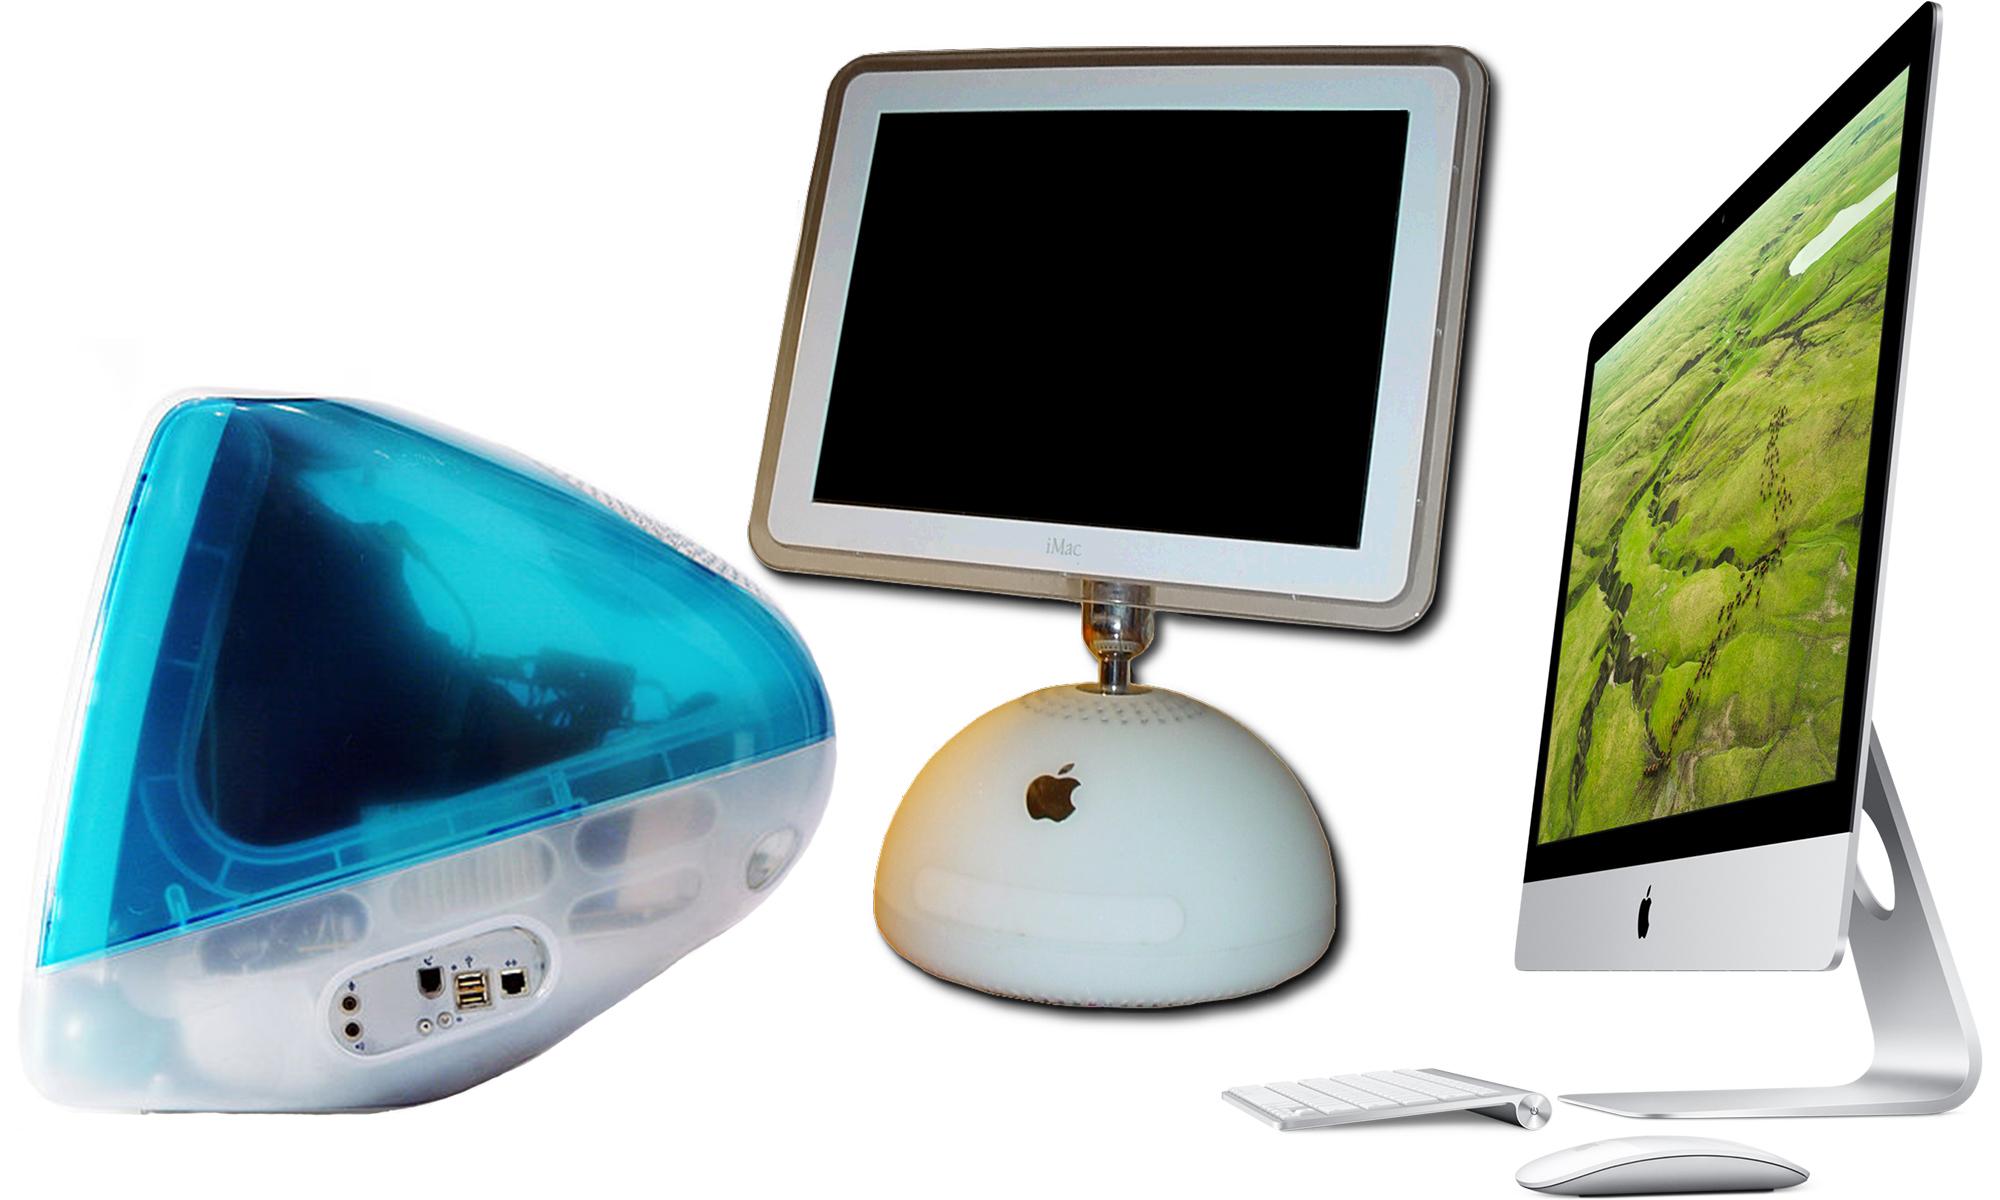 Verschiedene iMac-Modelle